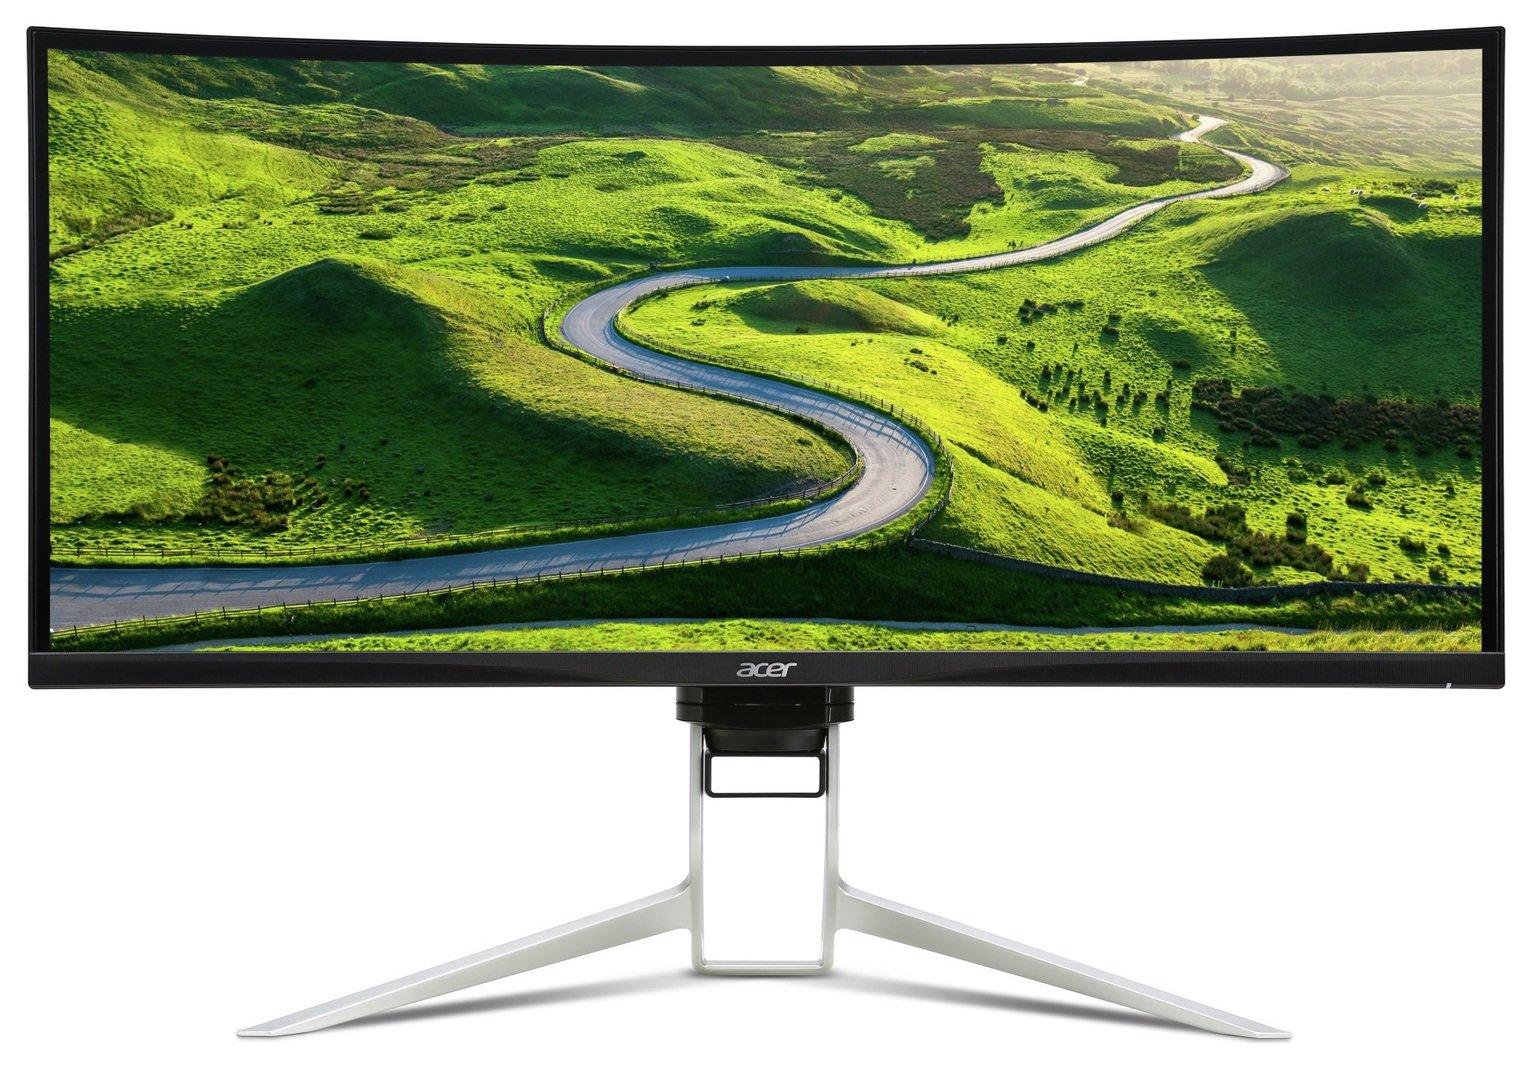 Acer Acer XR382 37.5 Inch LED Monitor